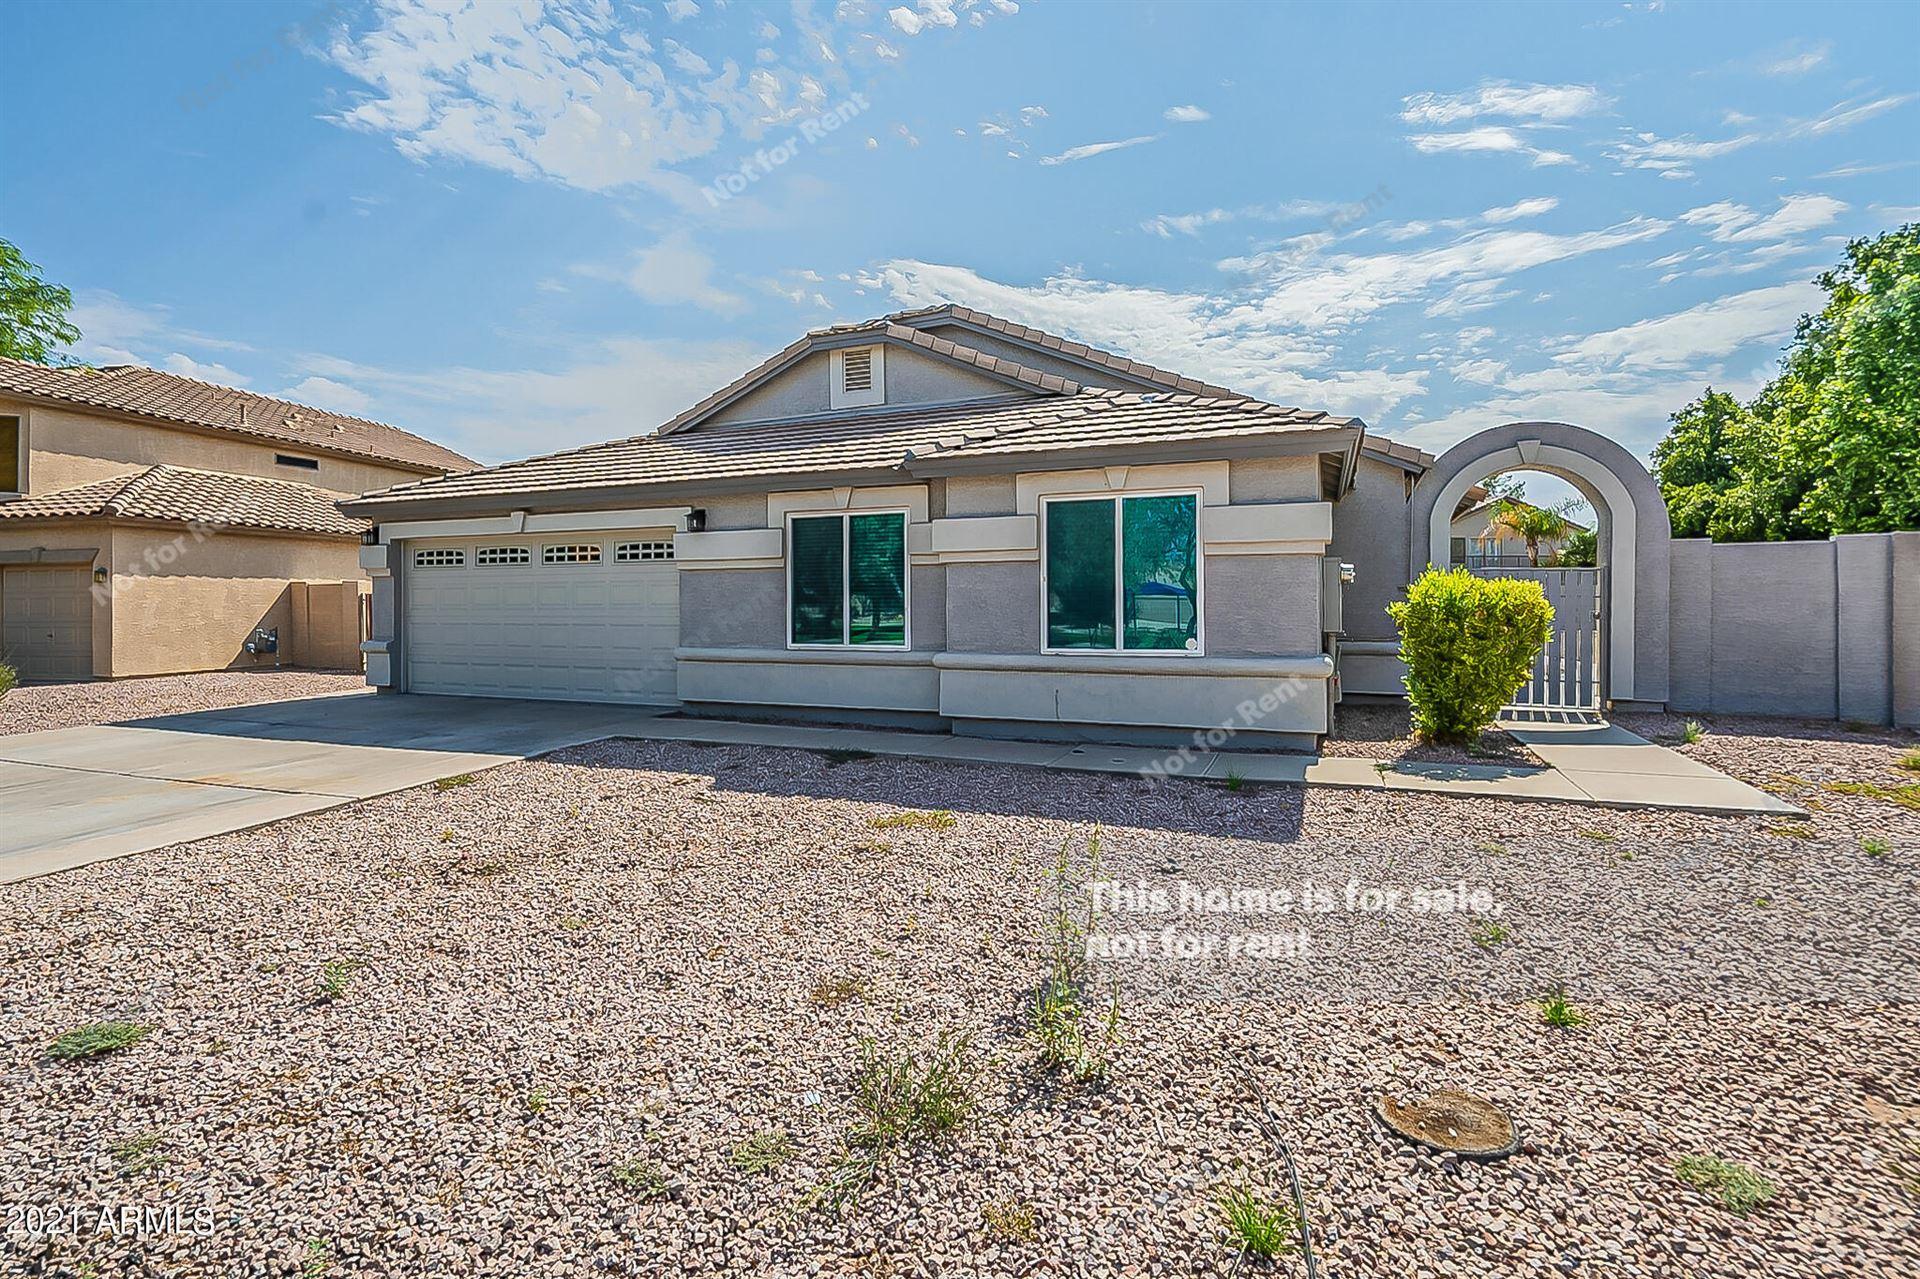 Photo of 501 W MERRILL Avenue, Gilbert, AZ 85233 (MLS # 6296351)